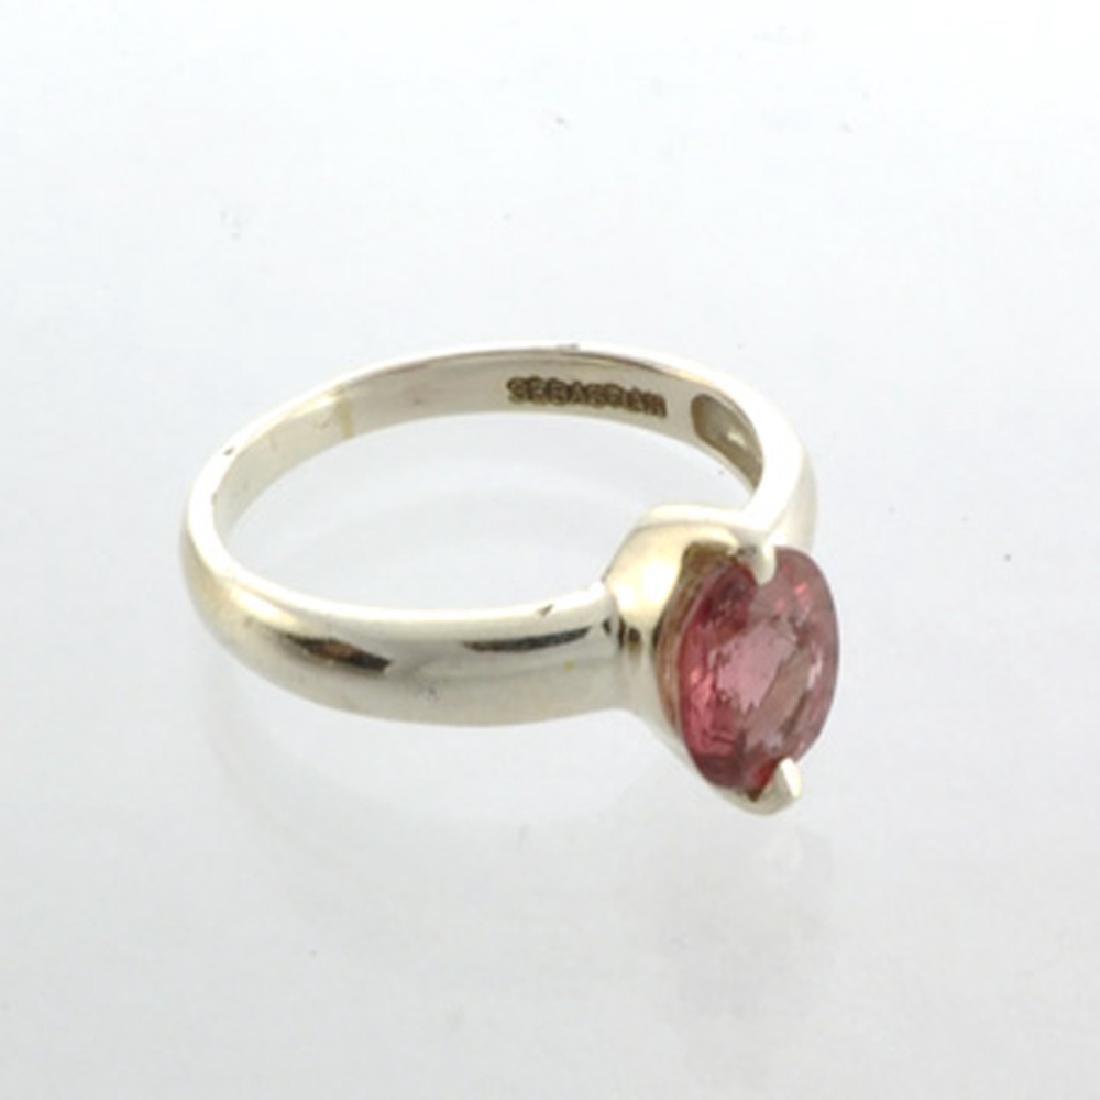 APP: 1k Fine Jewelry Designer Sebastian 1.40CT Oval Cut